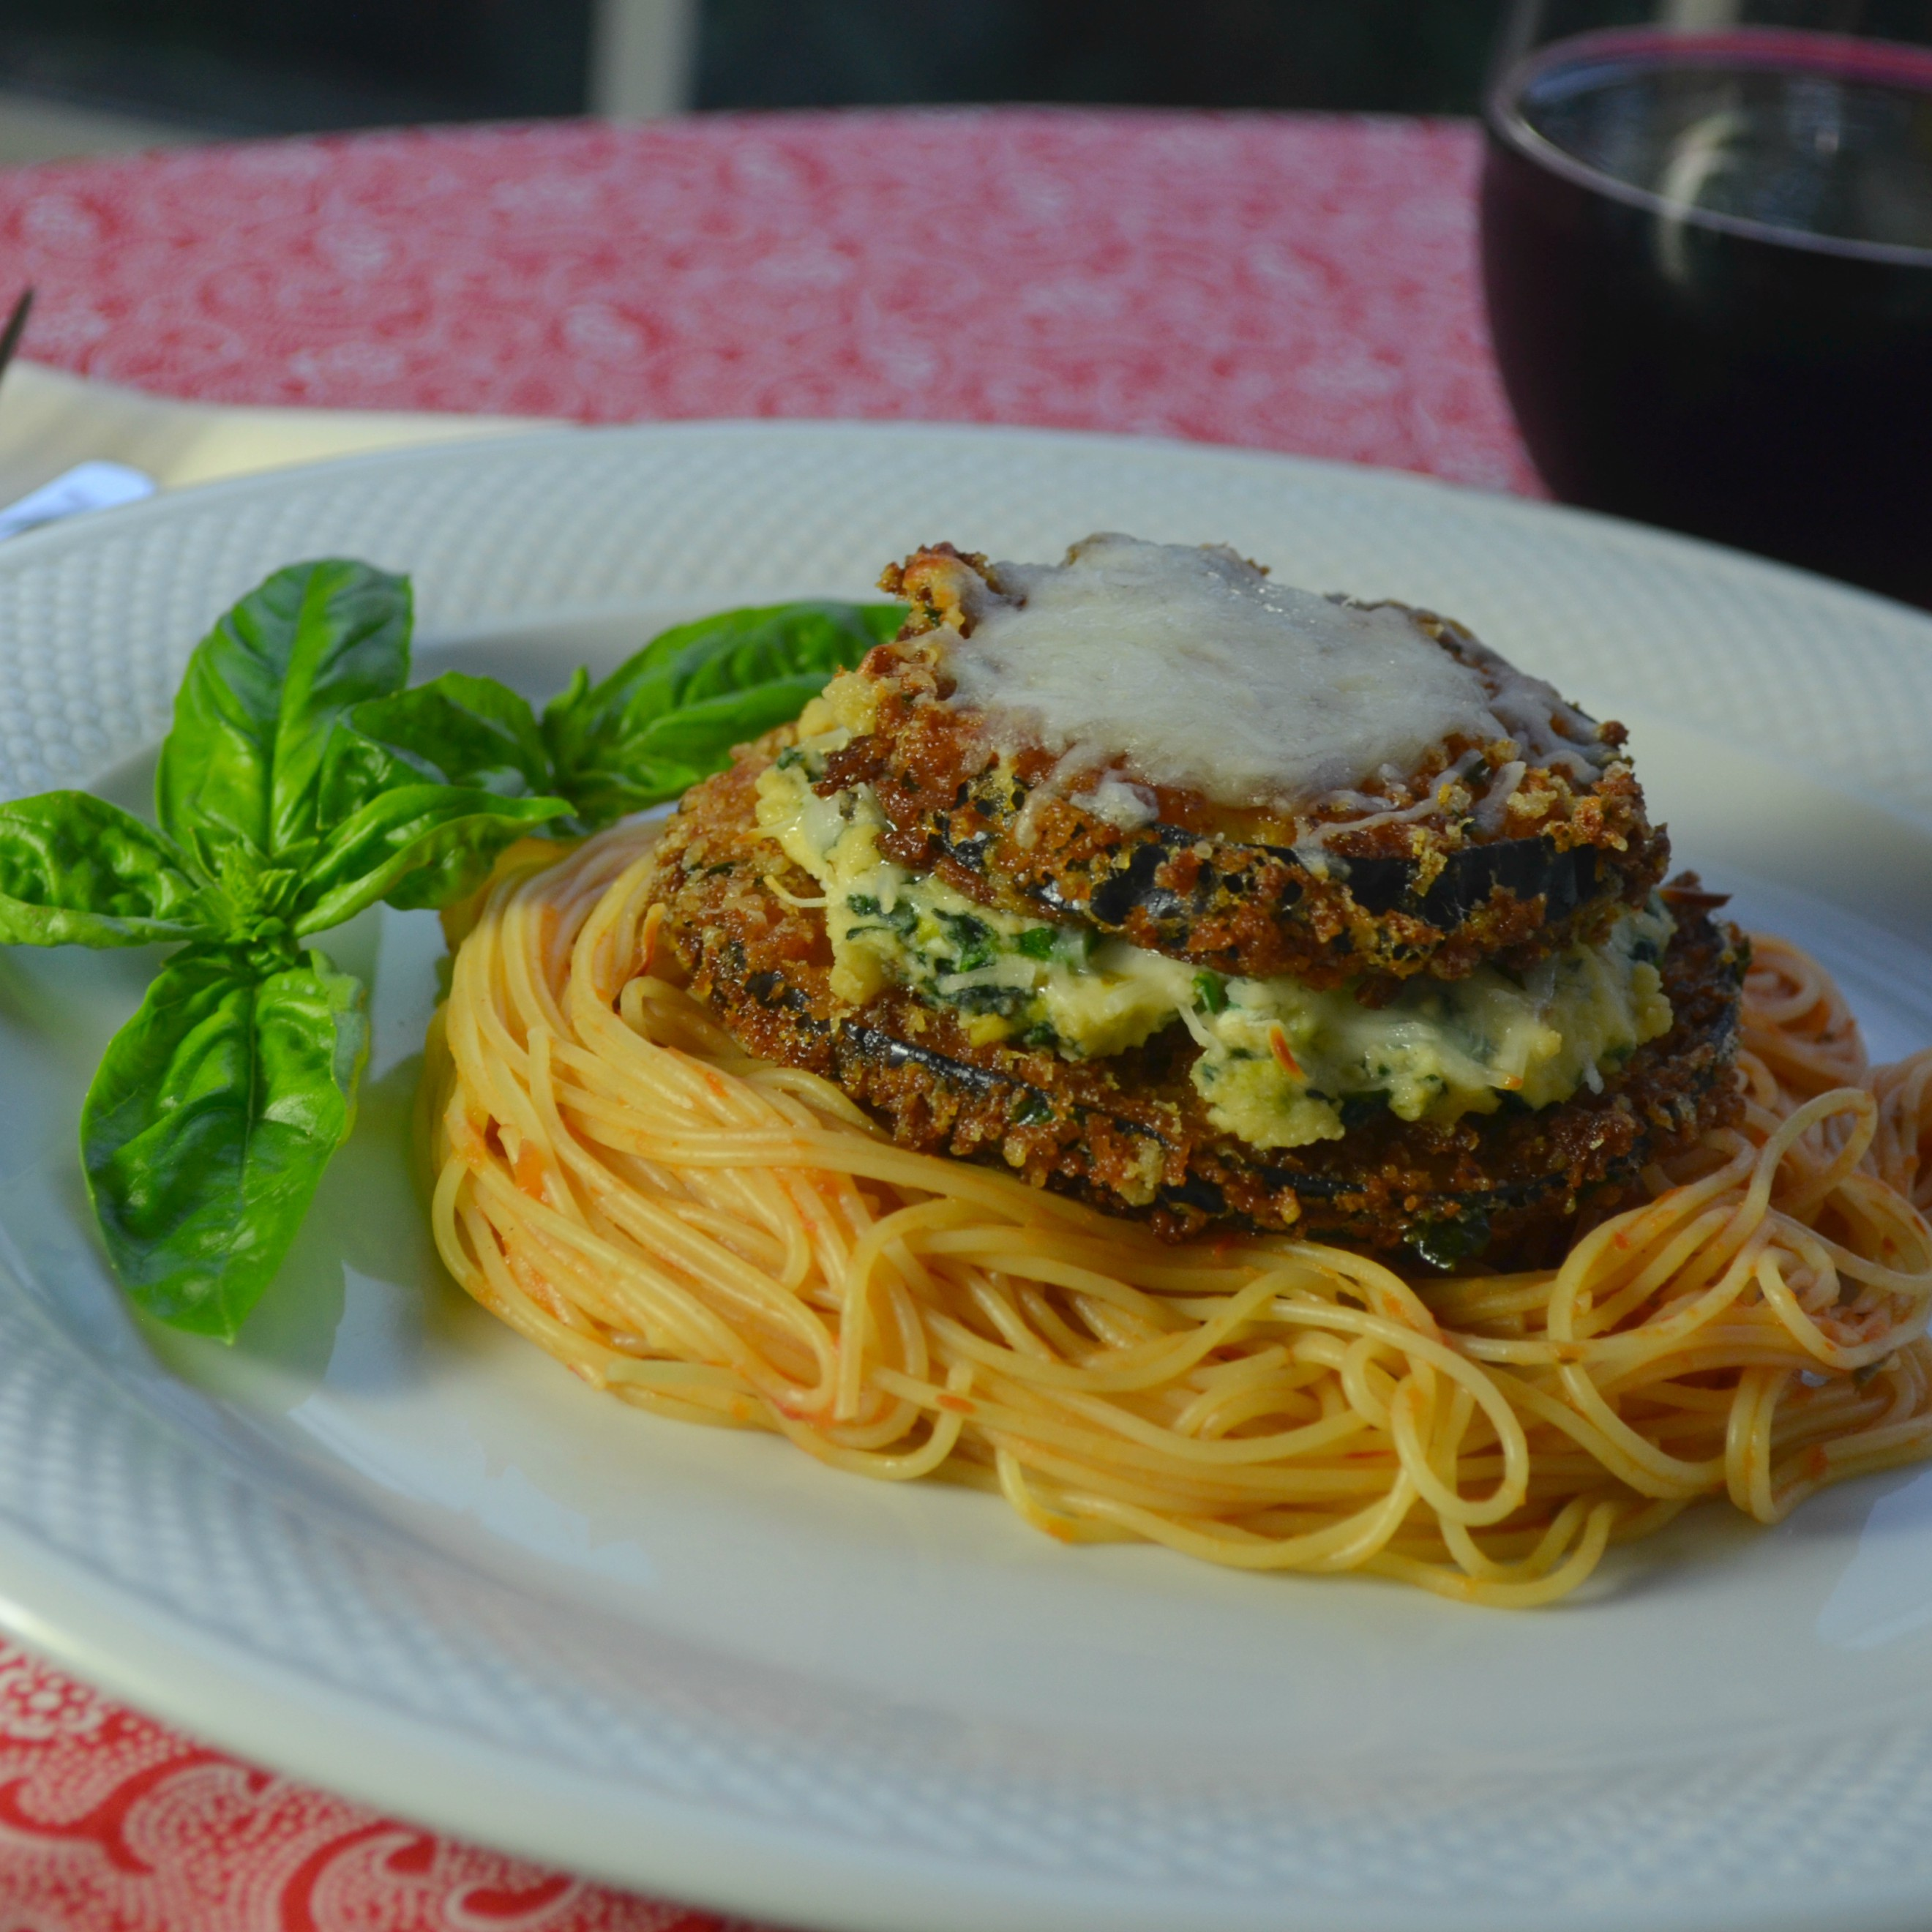 Panko and Beer Battered Eggplant Parmesan Stacks